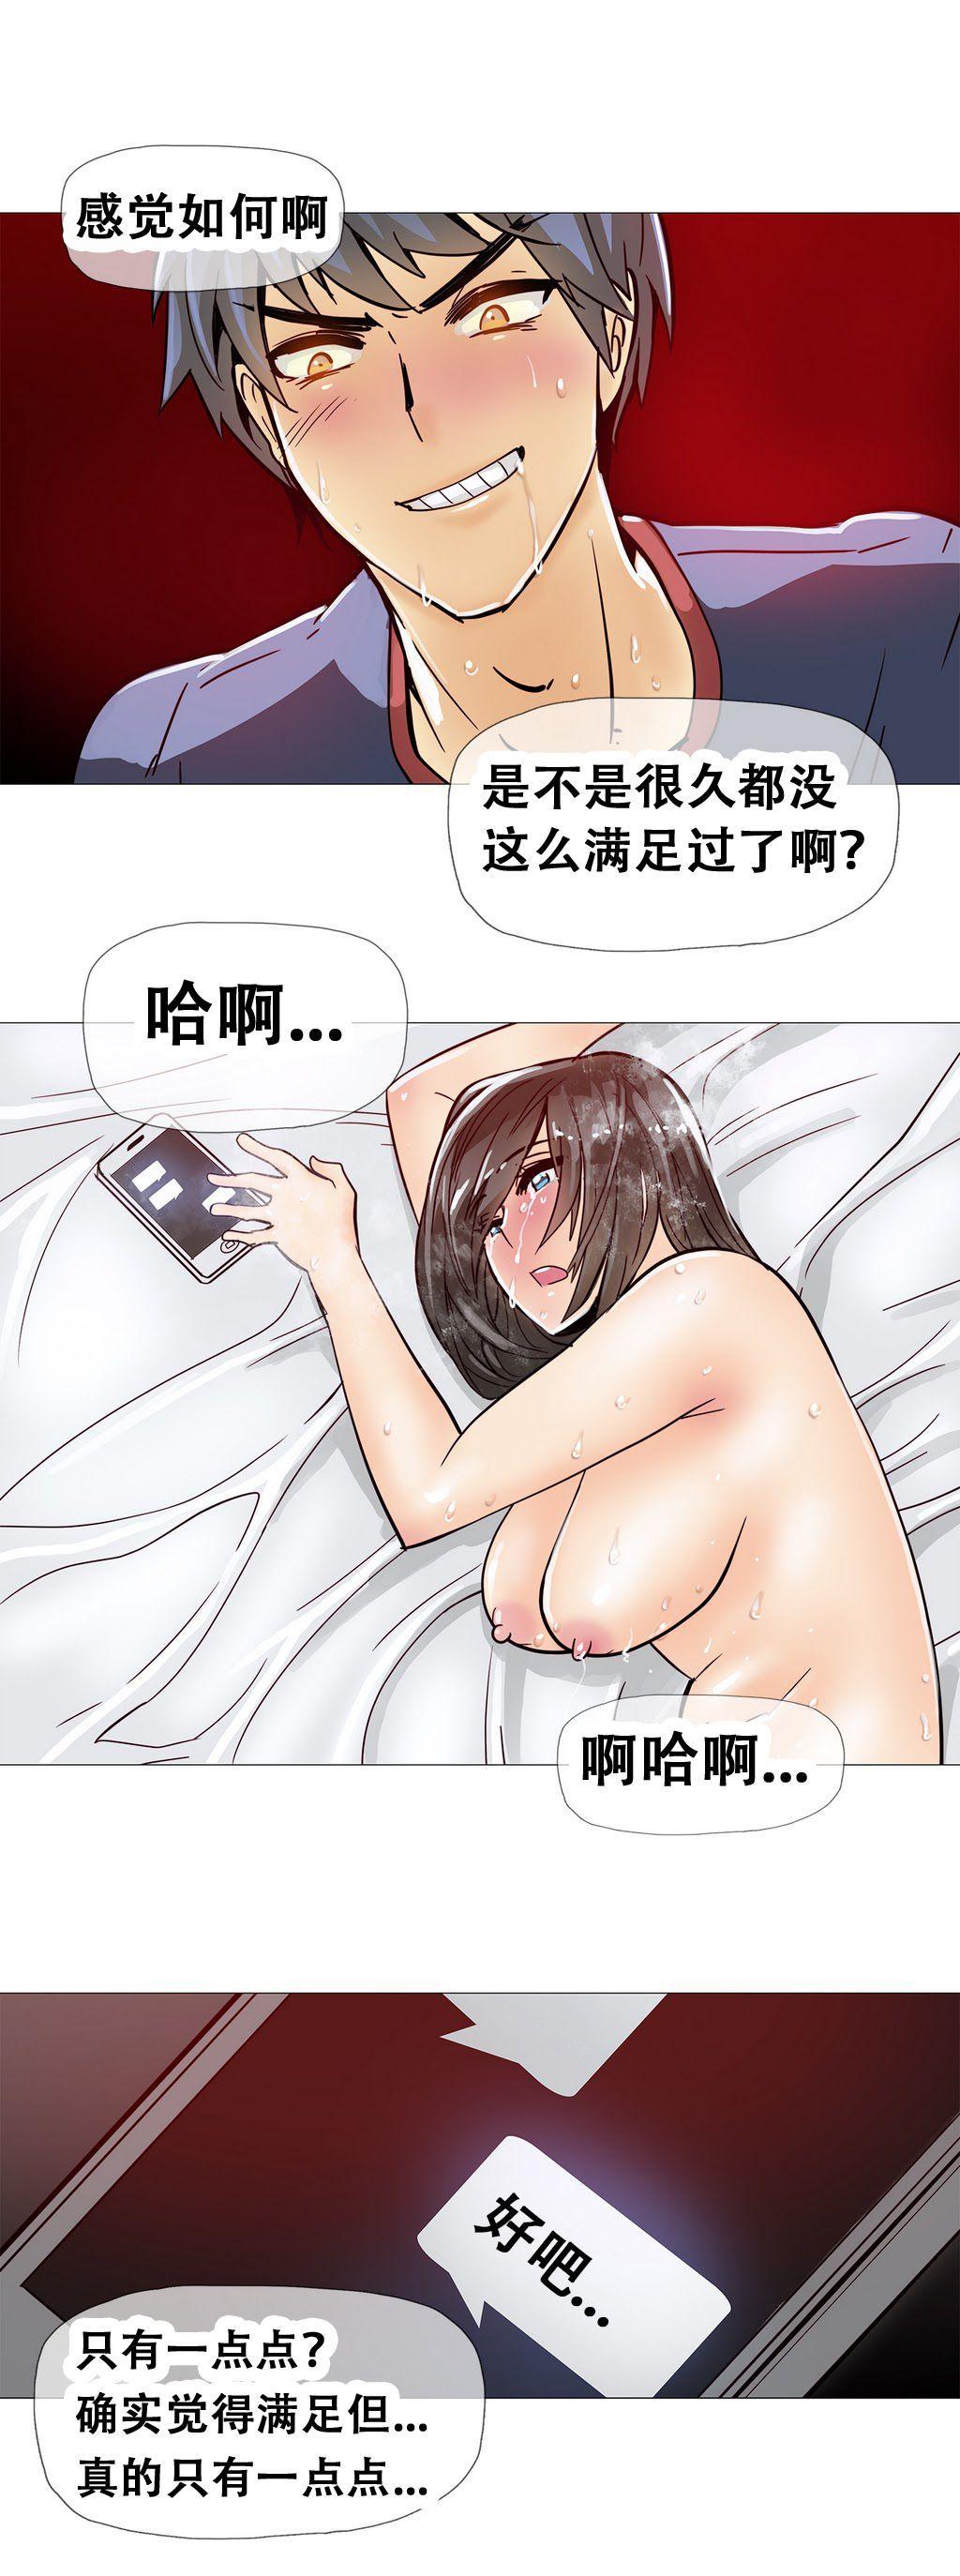 HouseHold Affairs 【卞赤鲤个人汉化】1~21话(持续更新中) 271